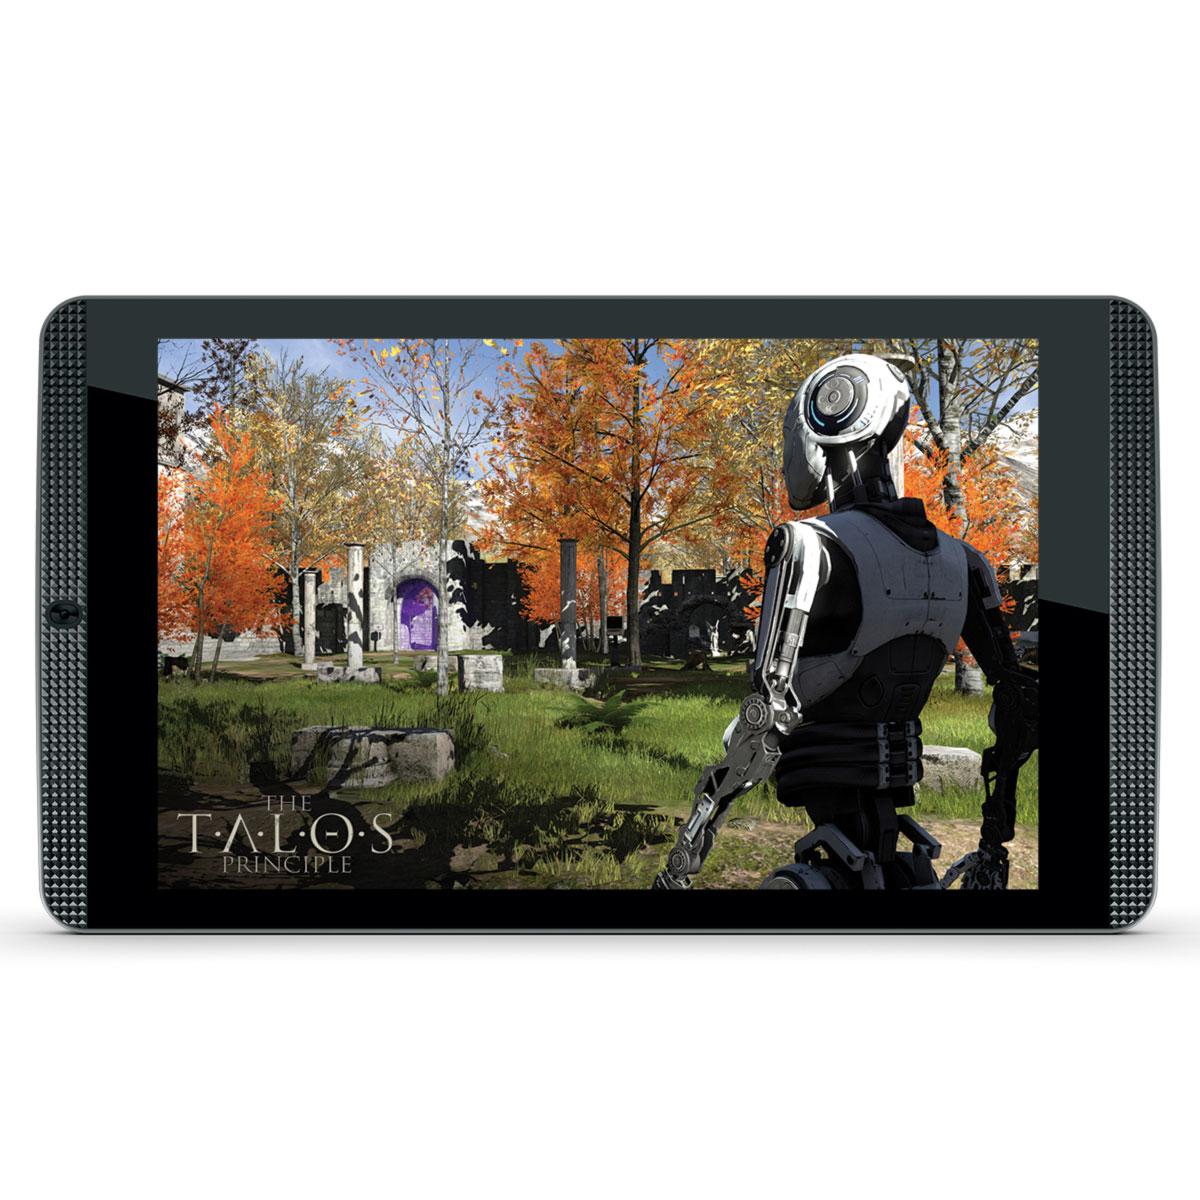 "Tablette tactile NVIDIA SHIELD Tablet K1 8"" 16 Go Noir Tablette Internet - NVIDIA Tegra K1 2.2 GHz Quad-Core - 2 Go 16 Go 8"" tactile Wi-Fi/Bluetooth/Webcam Android 5.0"